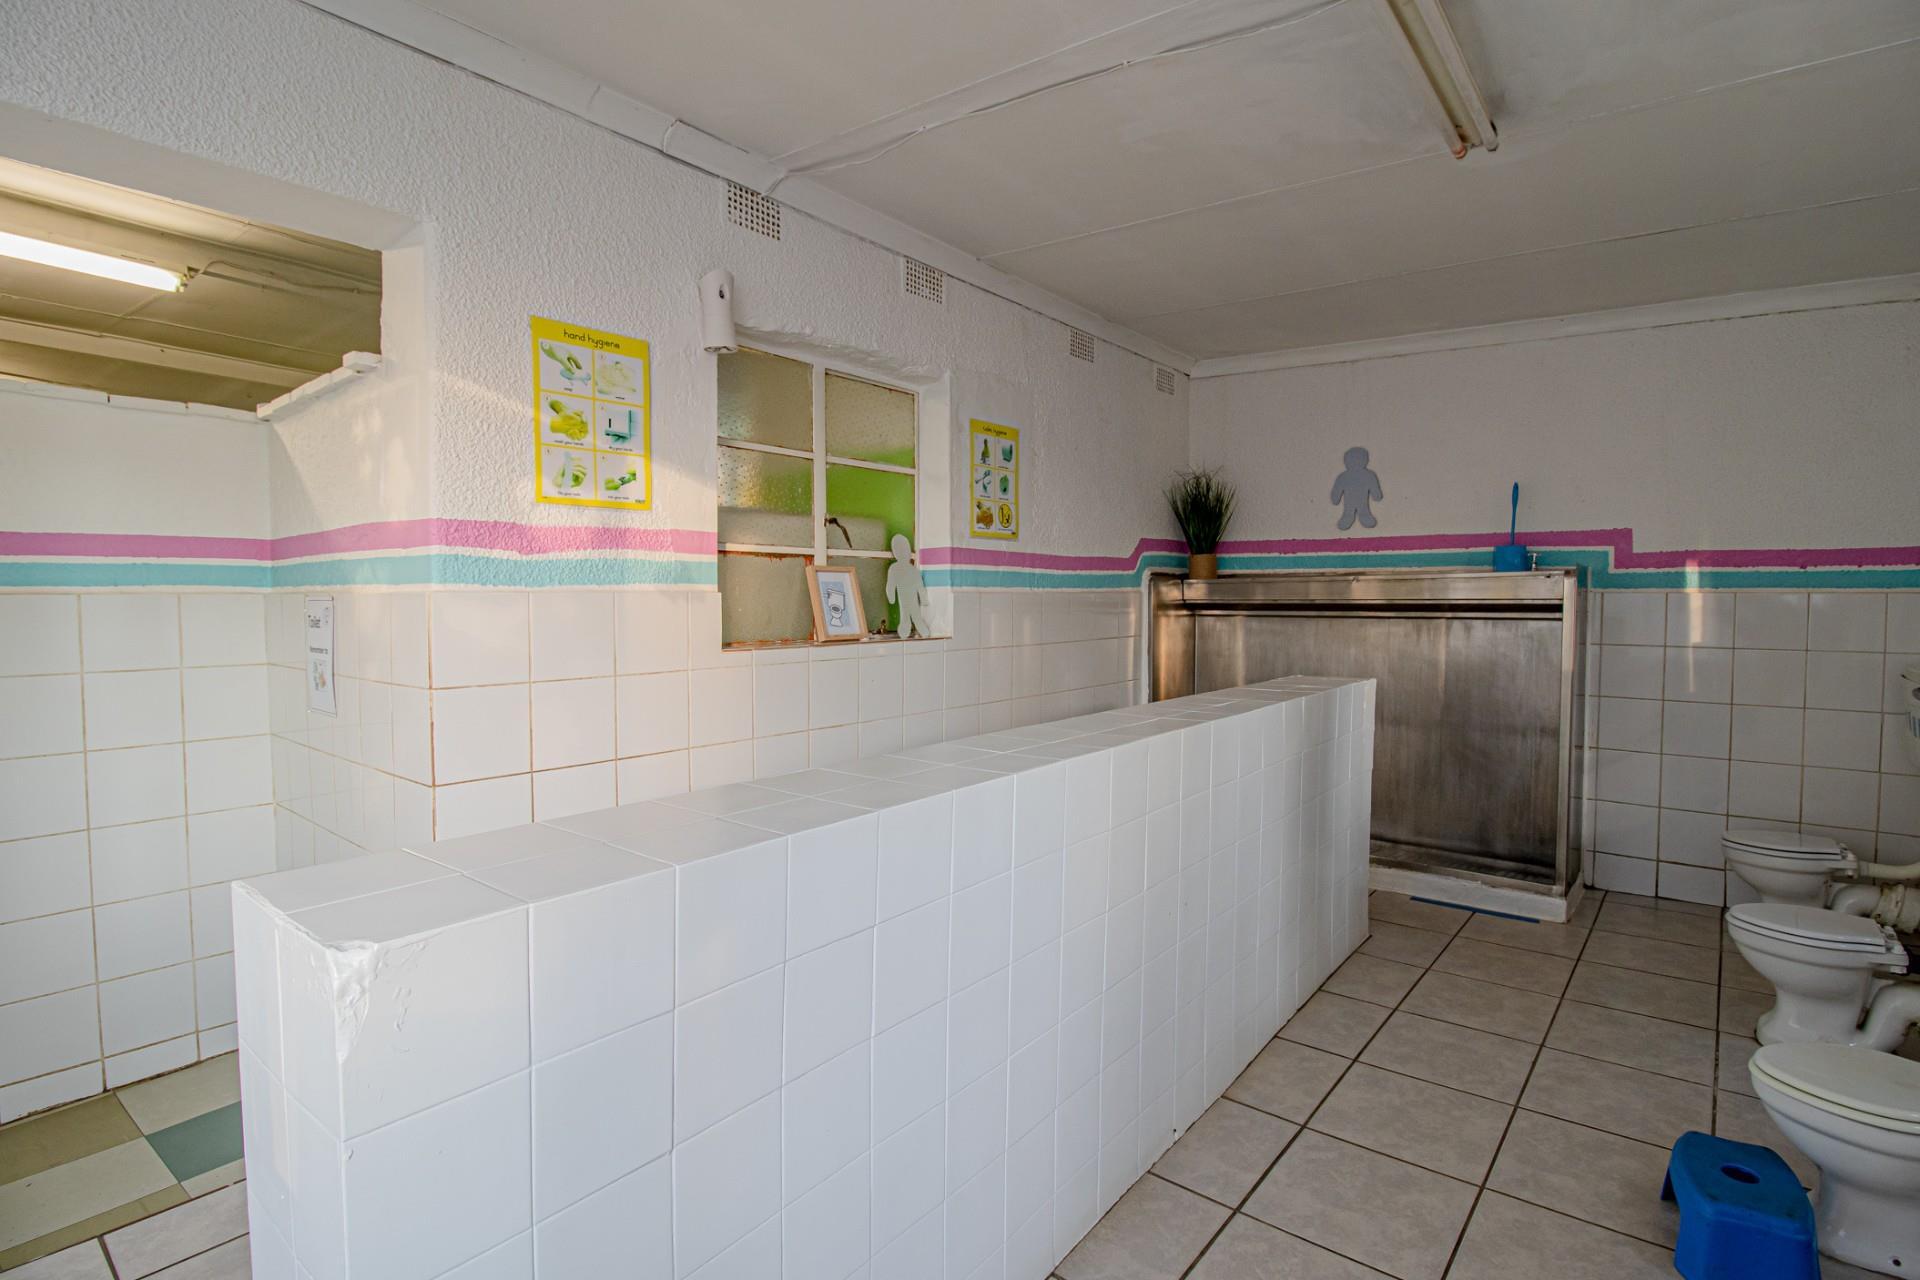 4 Bedroom House For Sale in Linden